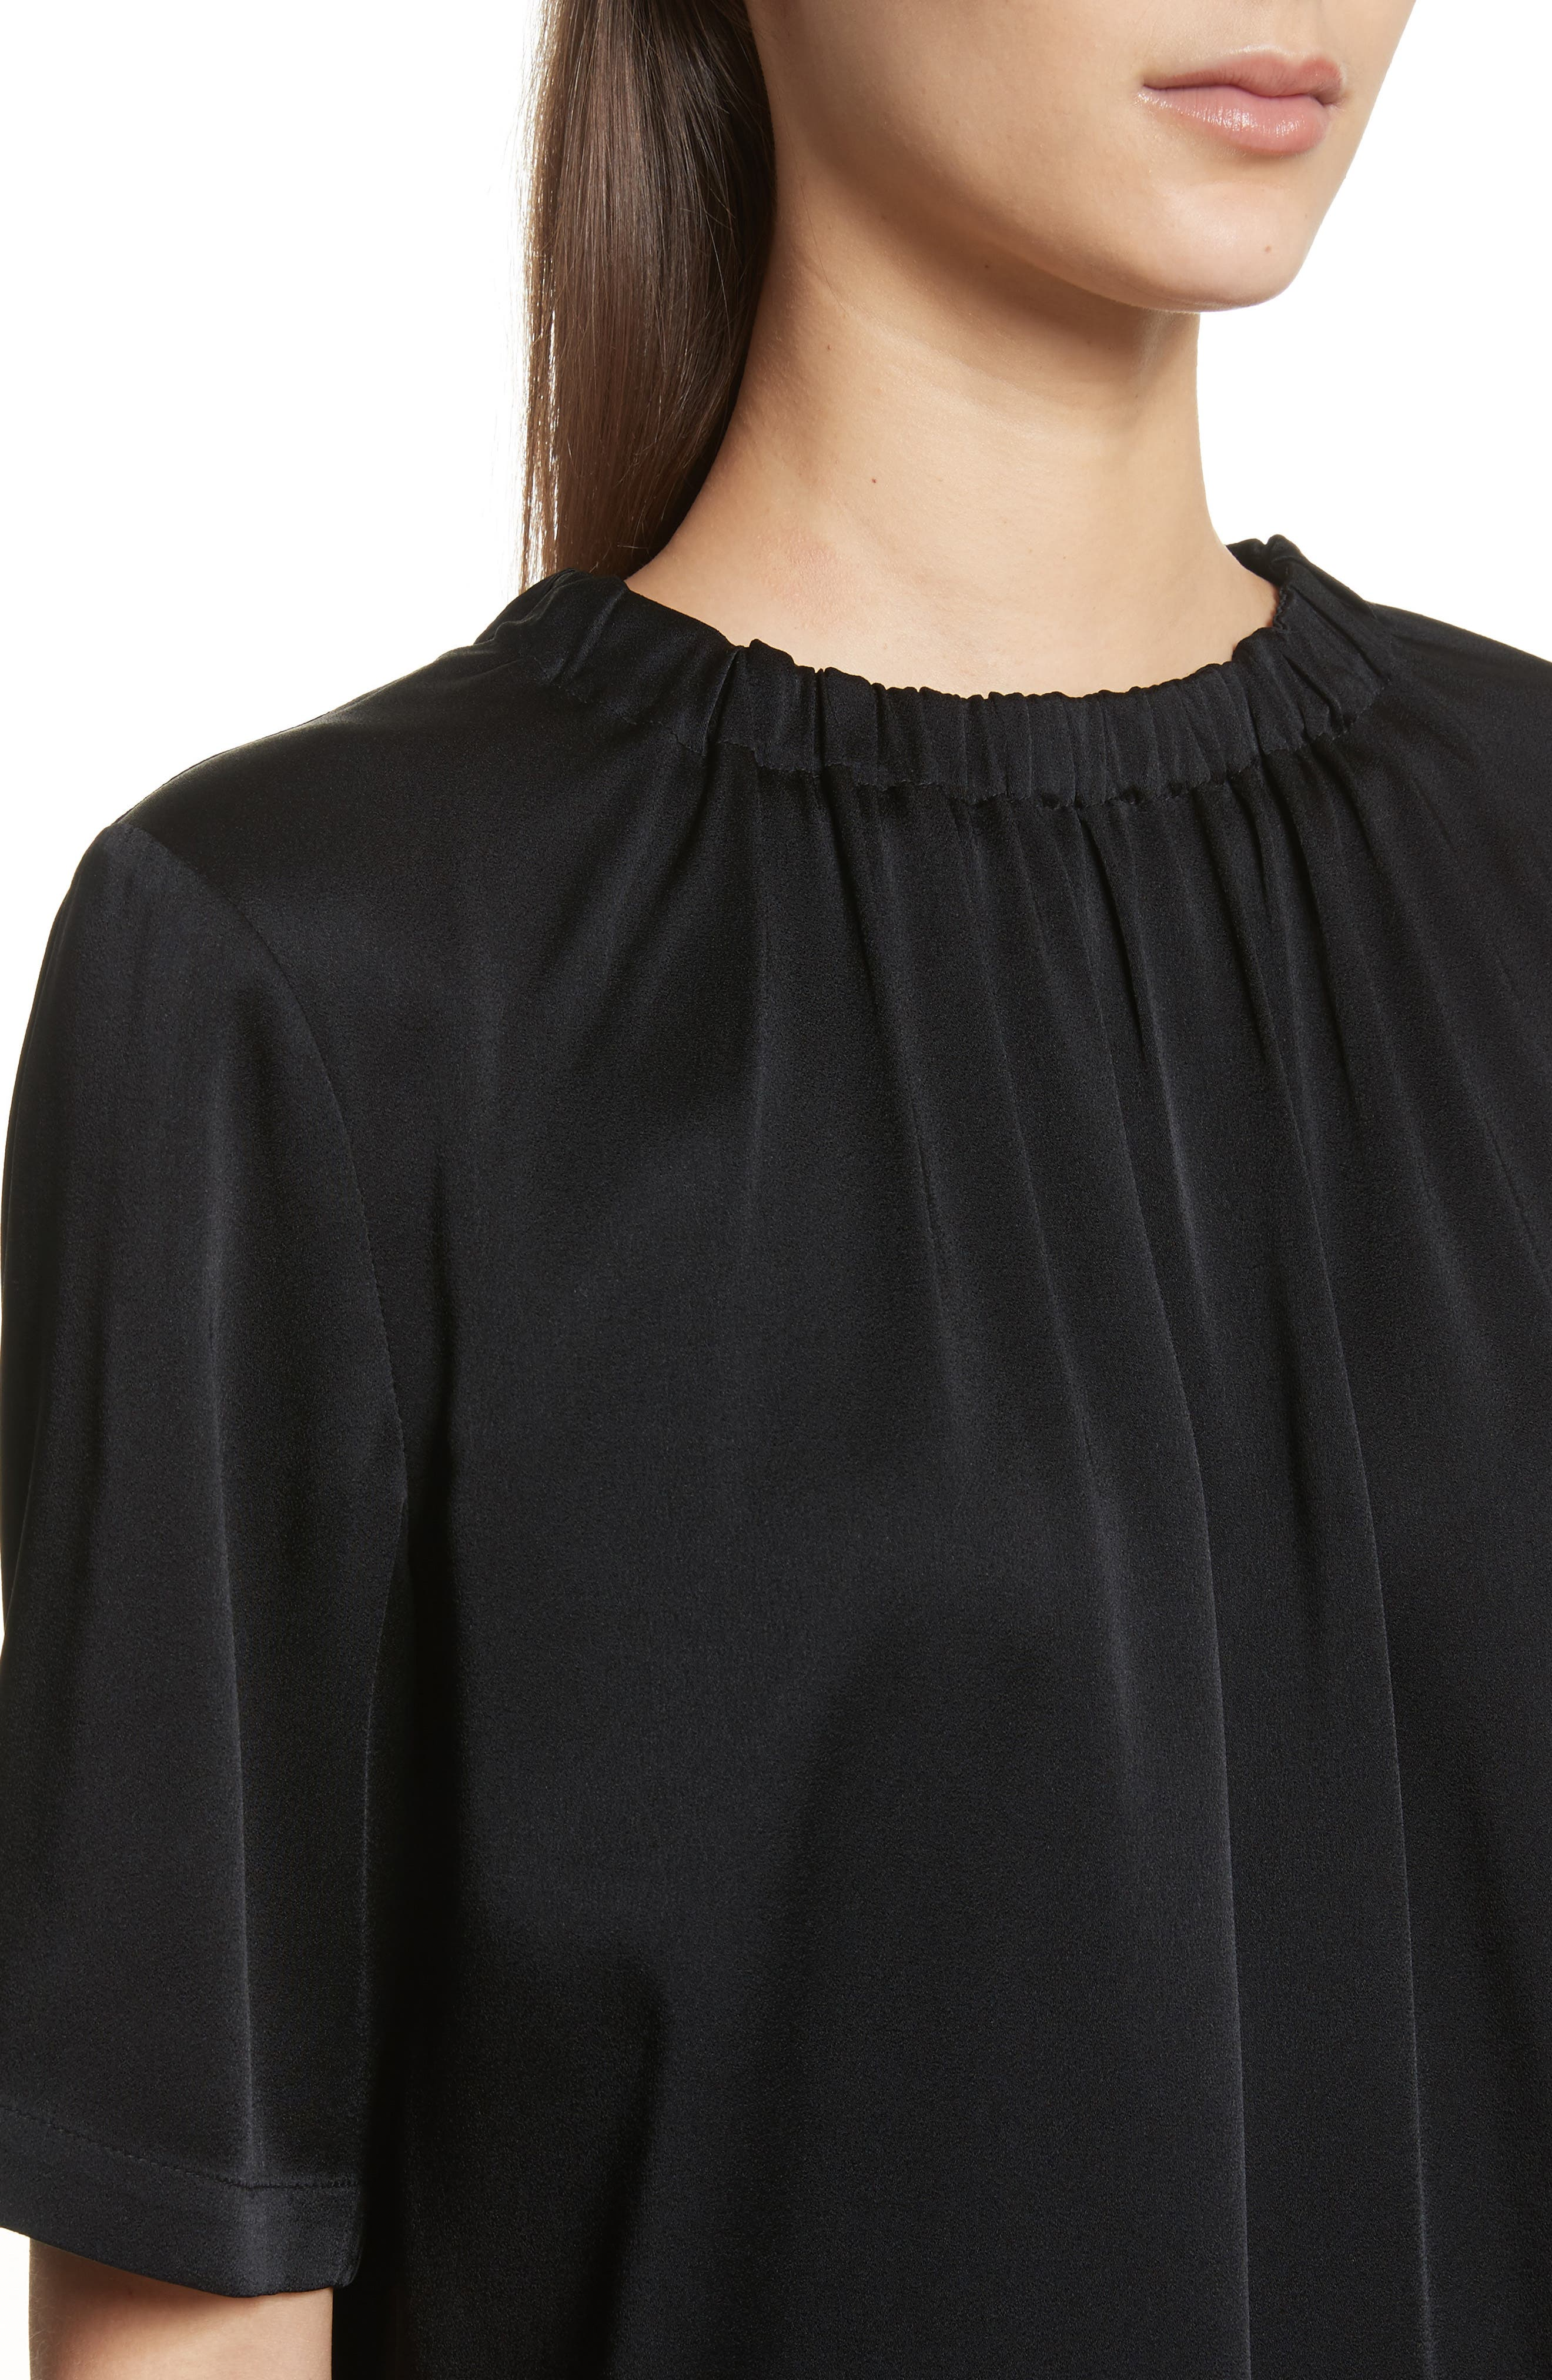 Gathered Neck Short Sleeve Top,                             Alternate thumbnail 4, color,                             Black